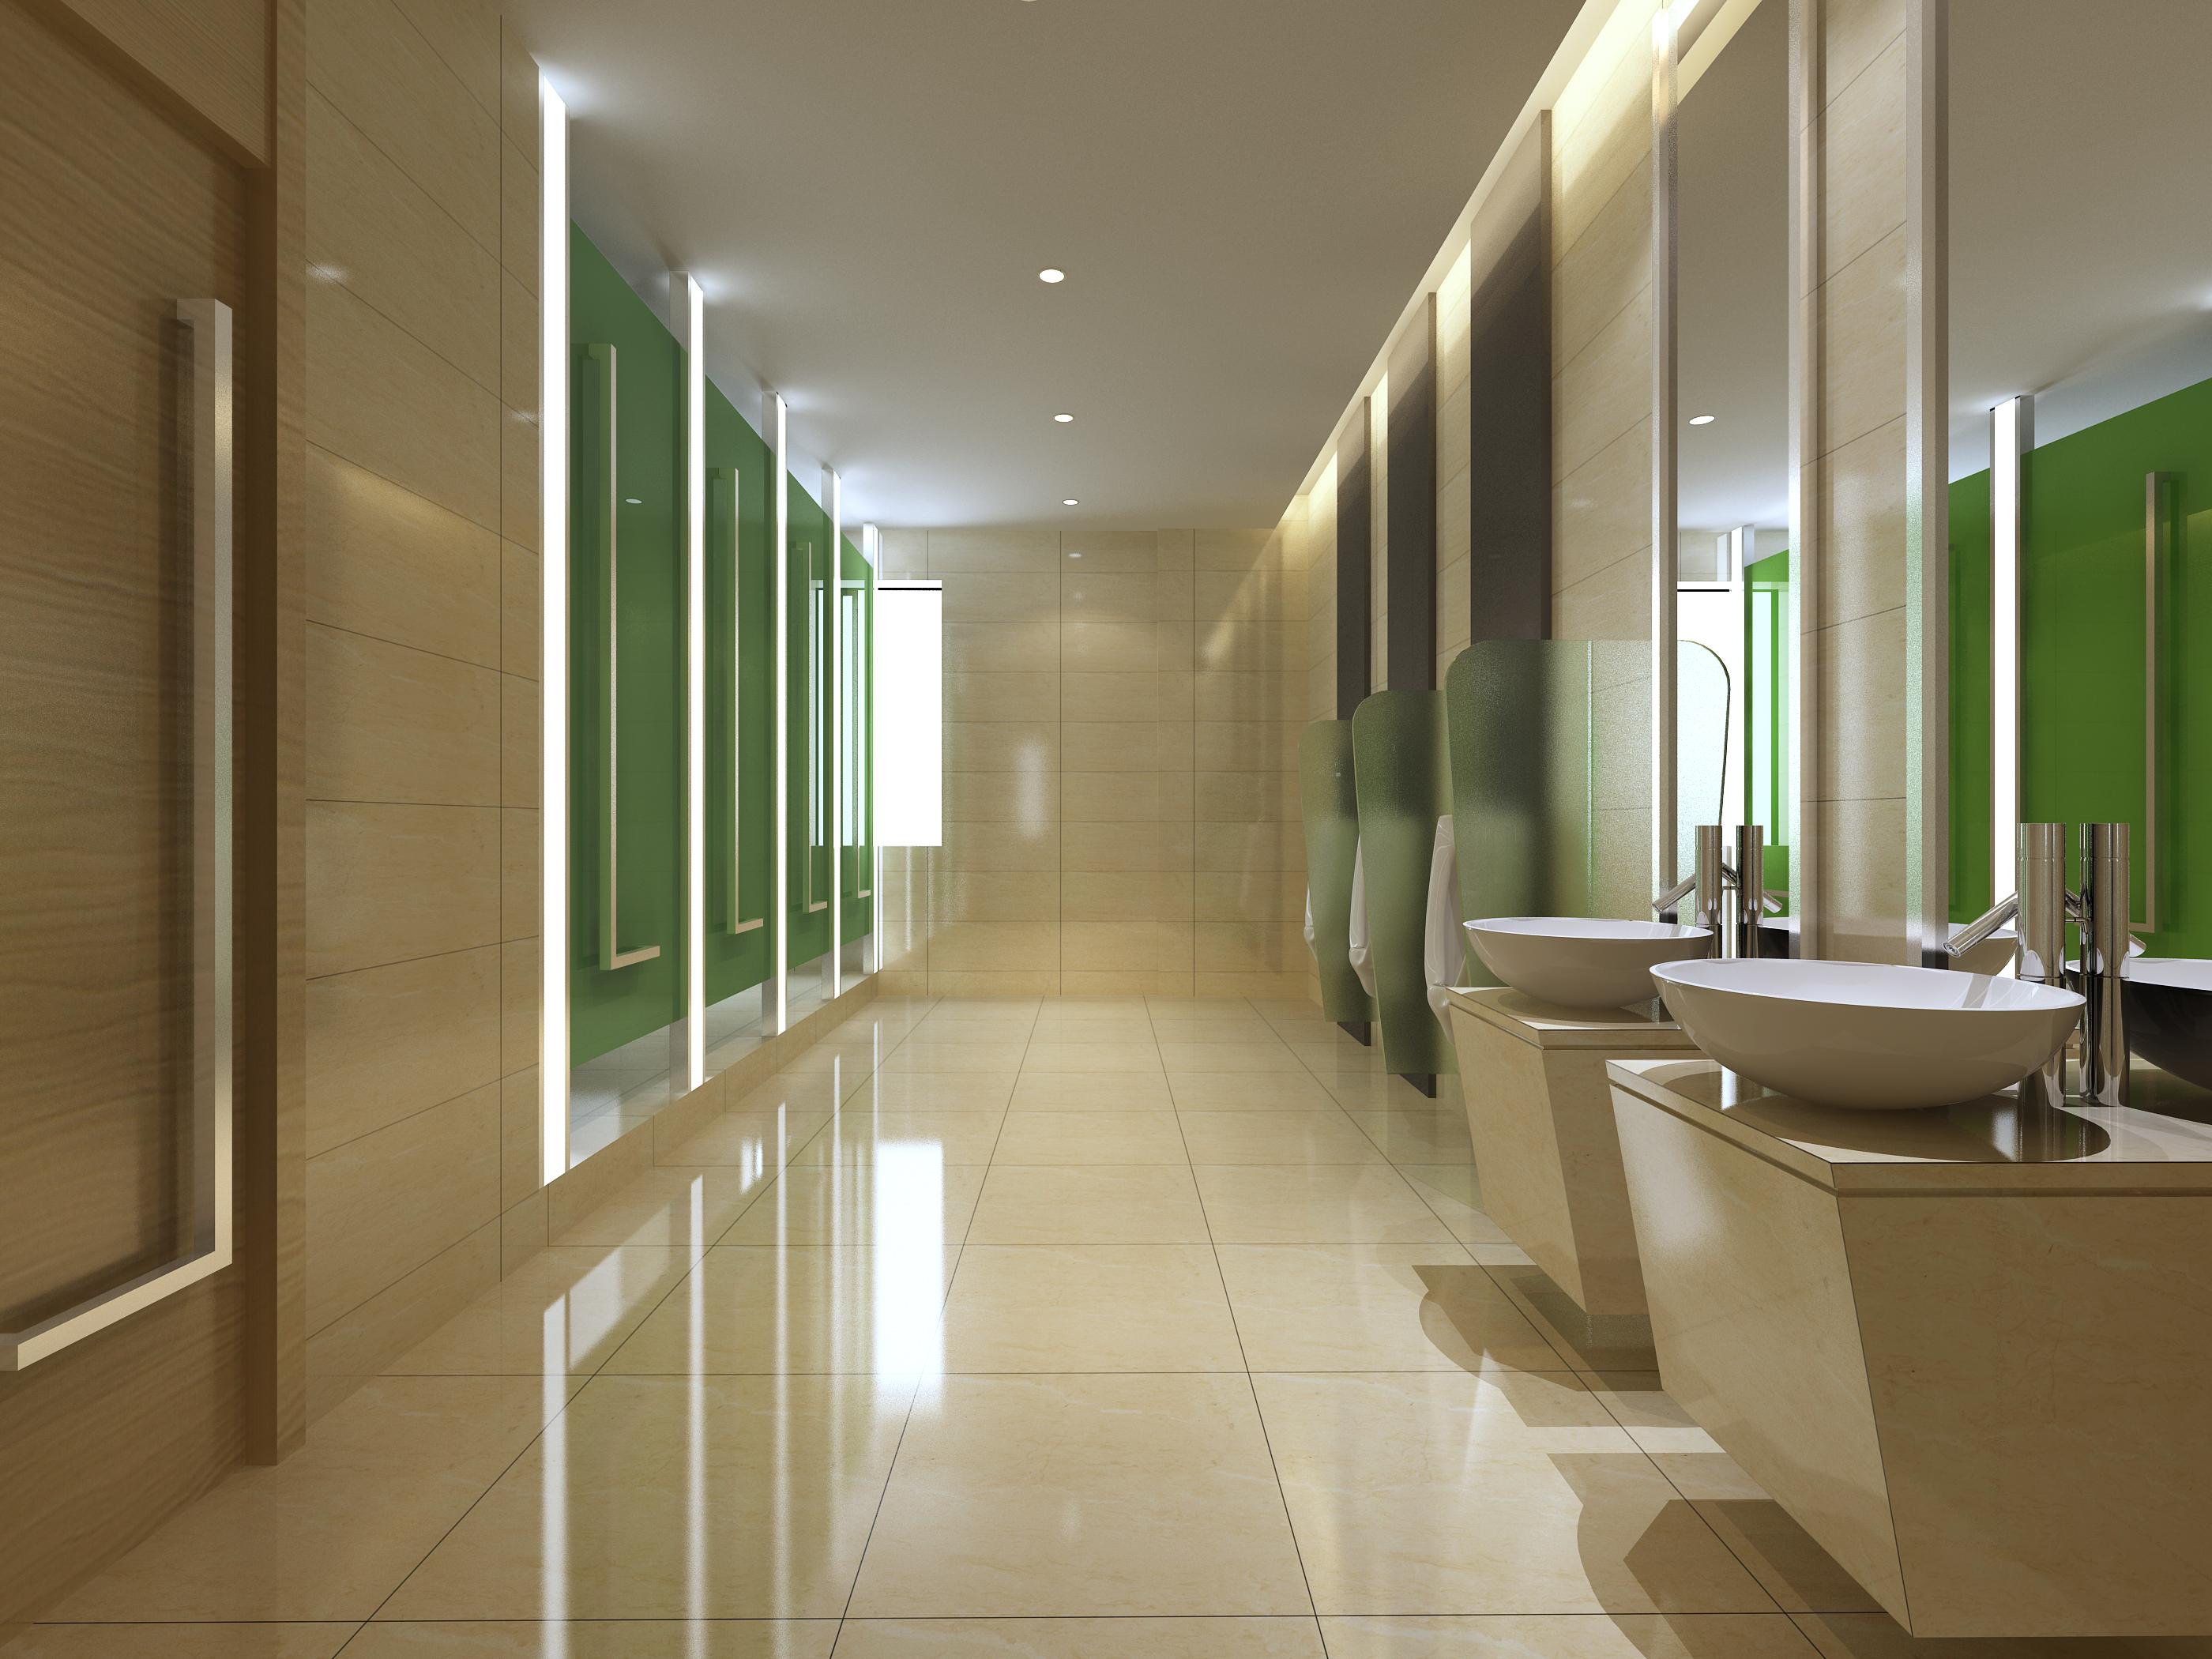 Contemporary Luxury Public Bathroom Design Ideas ~ Public toilet d model buy